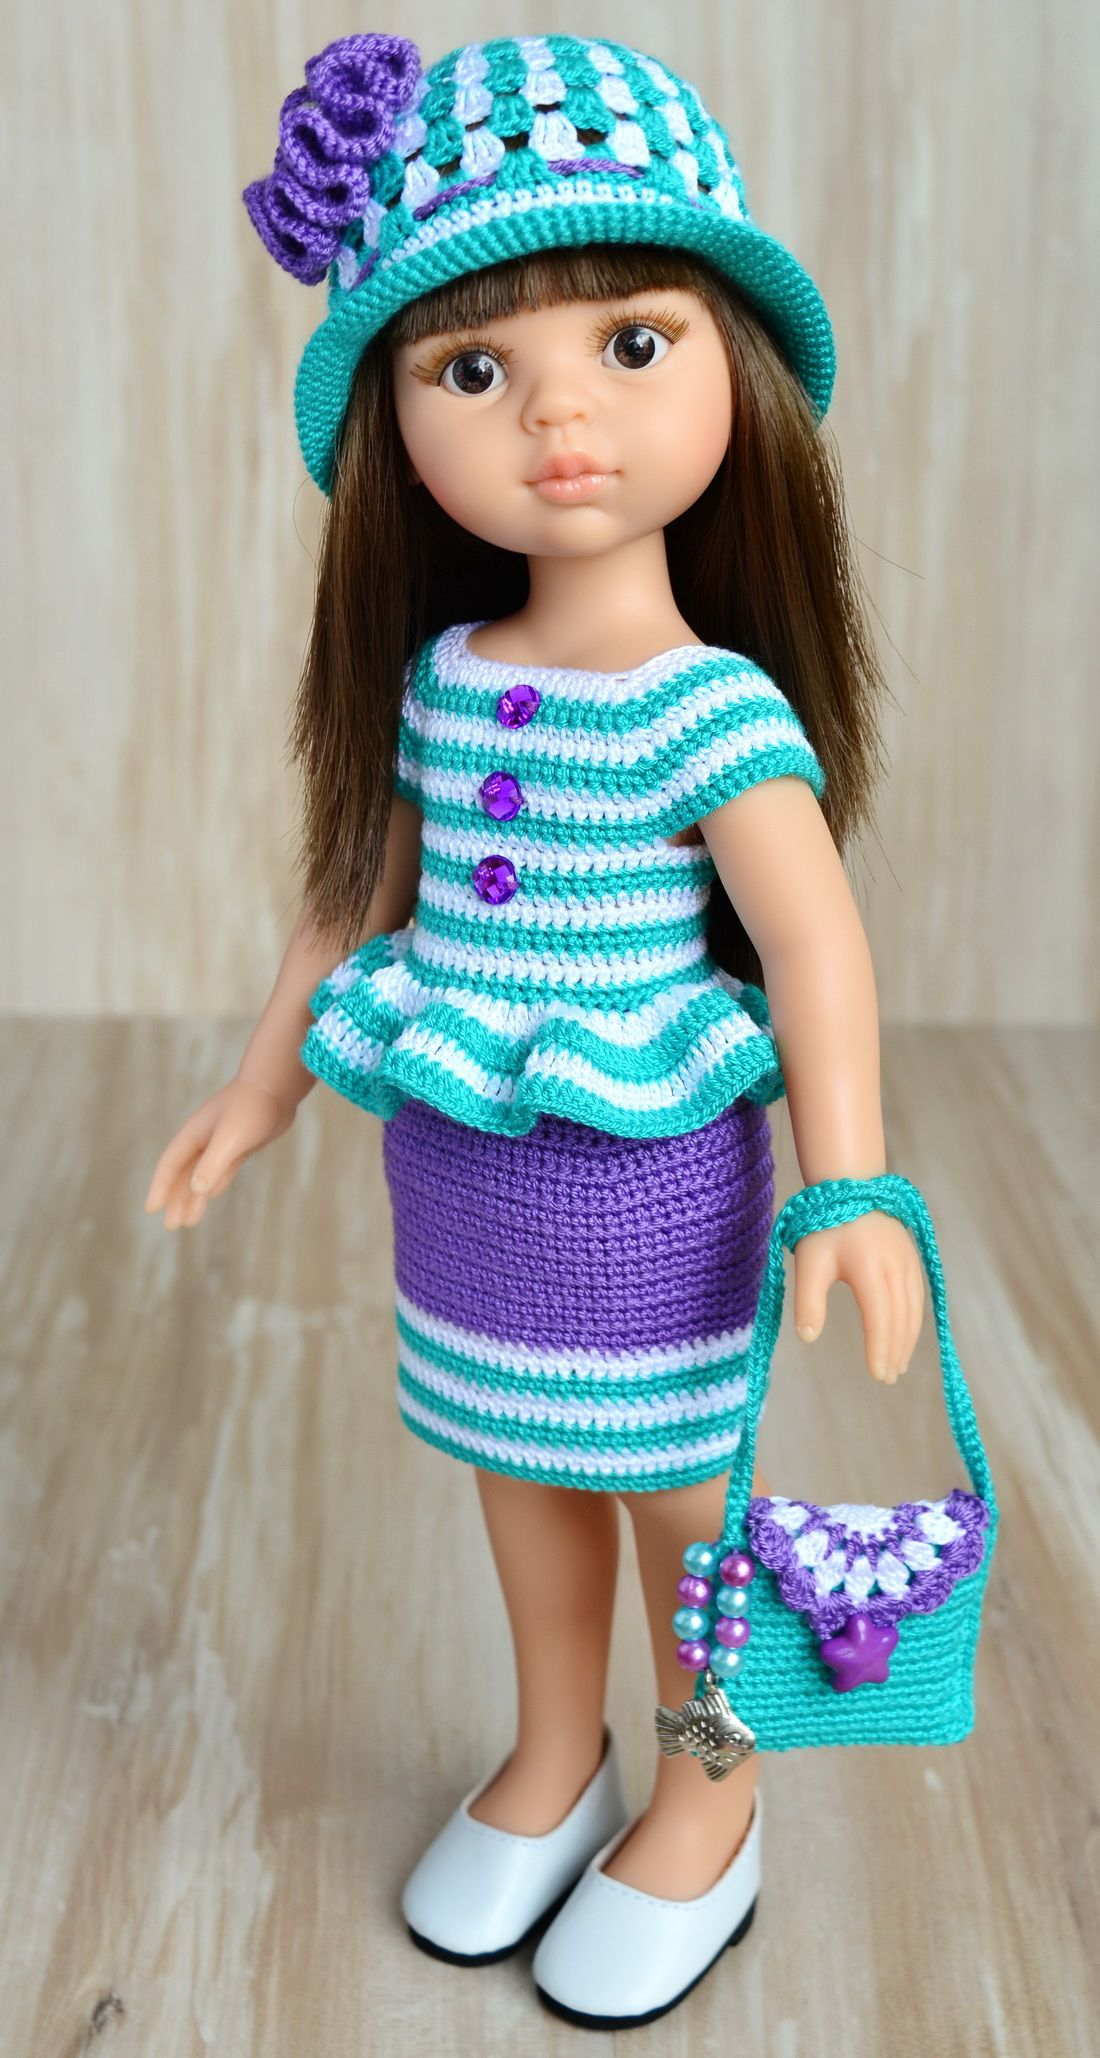 14.jpg | barbie modelos en crochet...!!! | Pinterest | Reinas ...